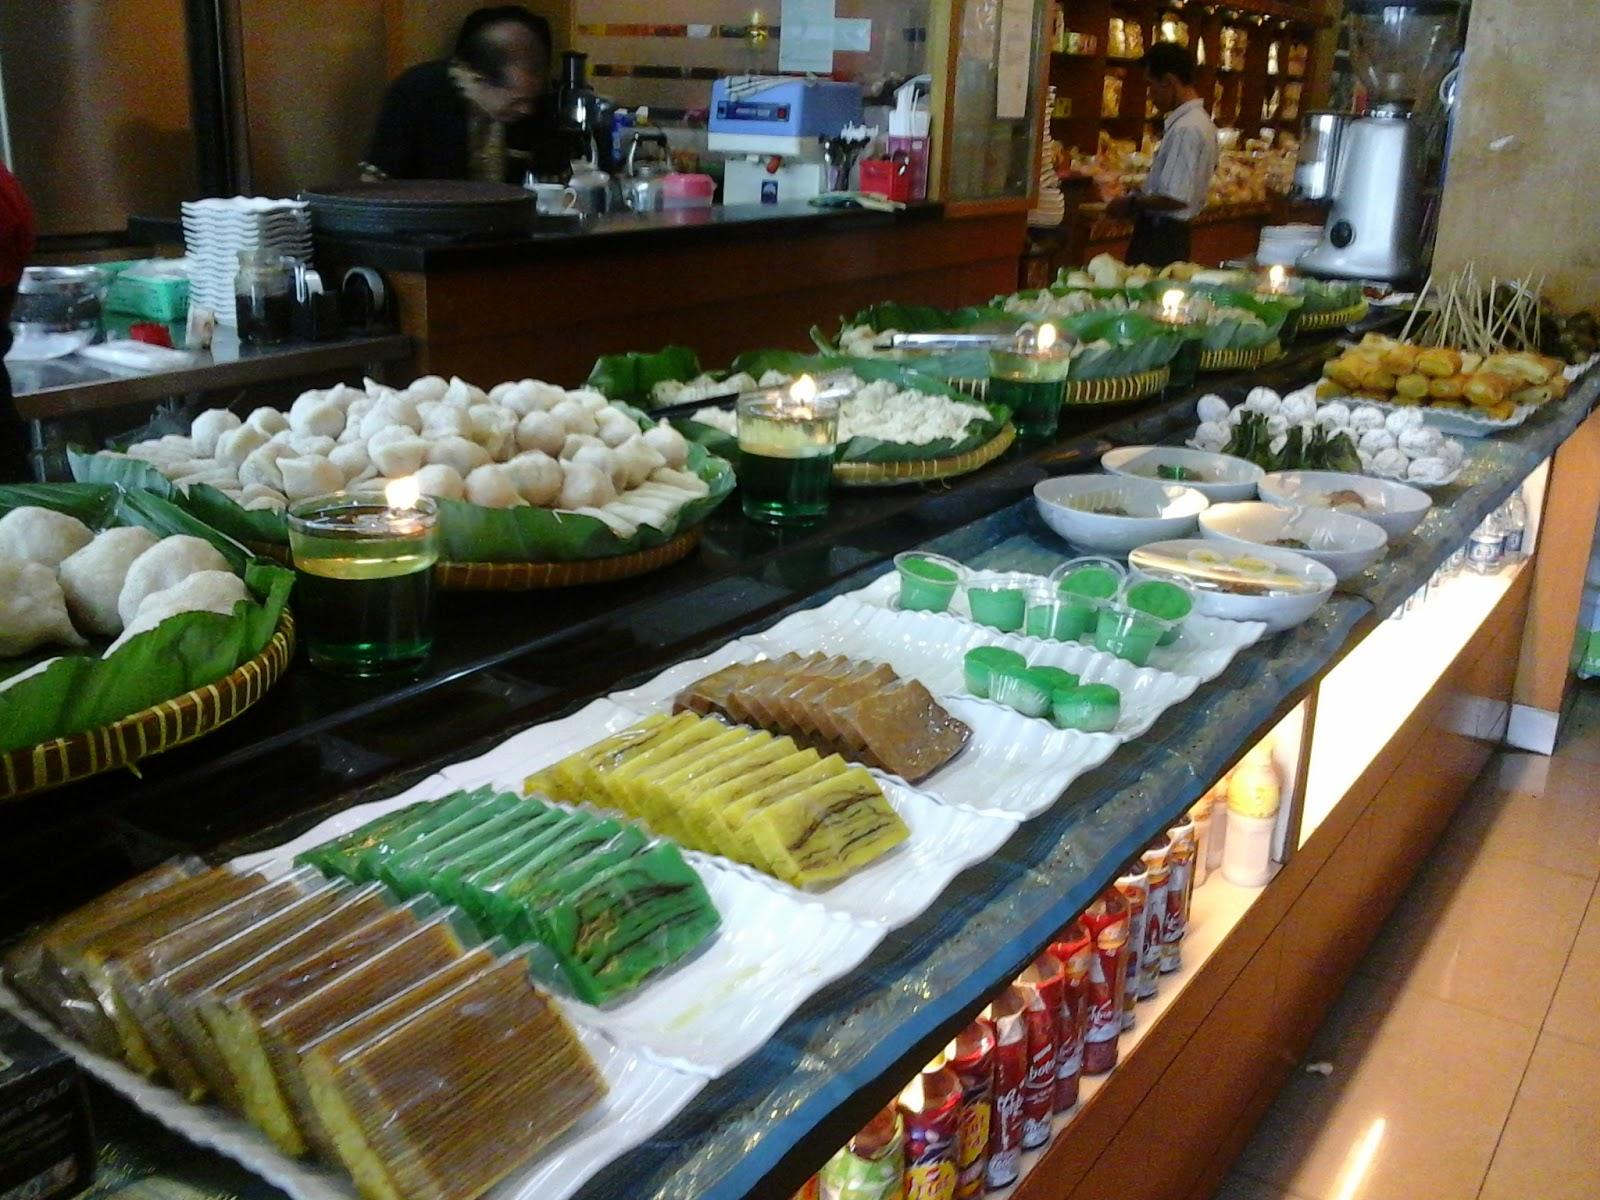 Wisata Kuliner Palembang Pempek Candy Restoran Cabang Terbanyak Kota